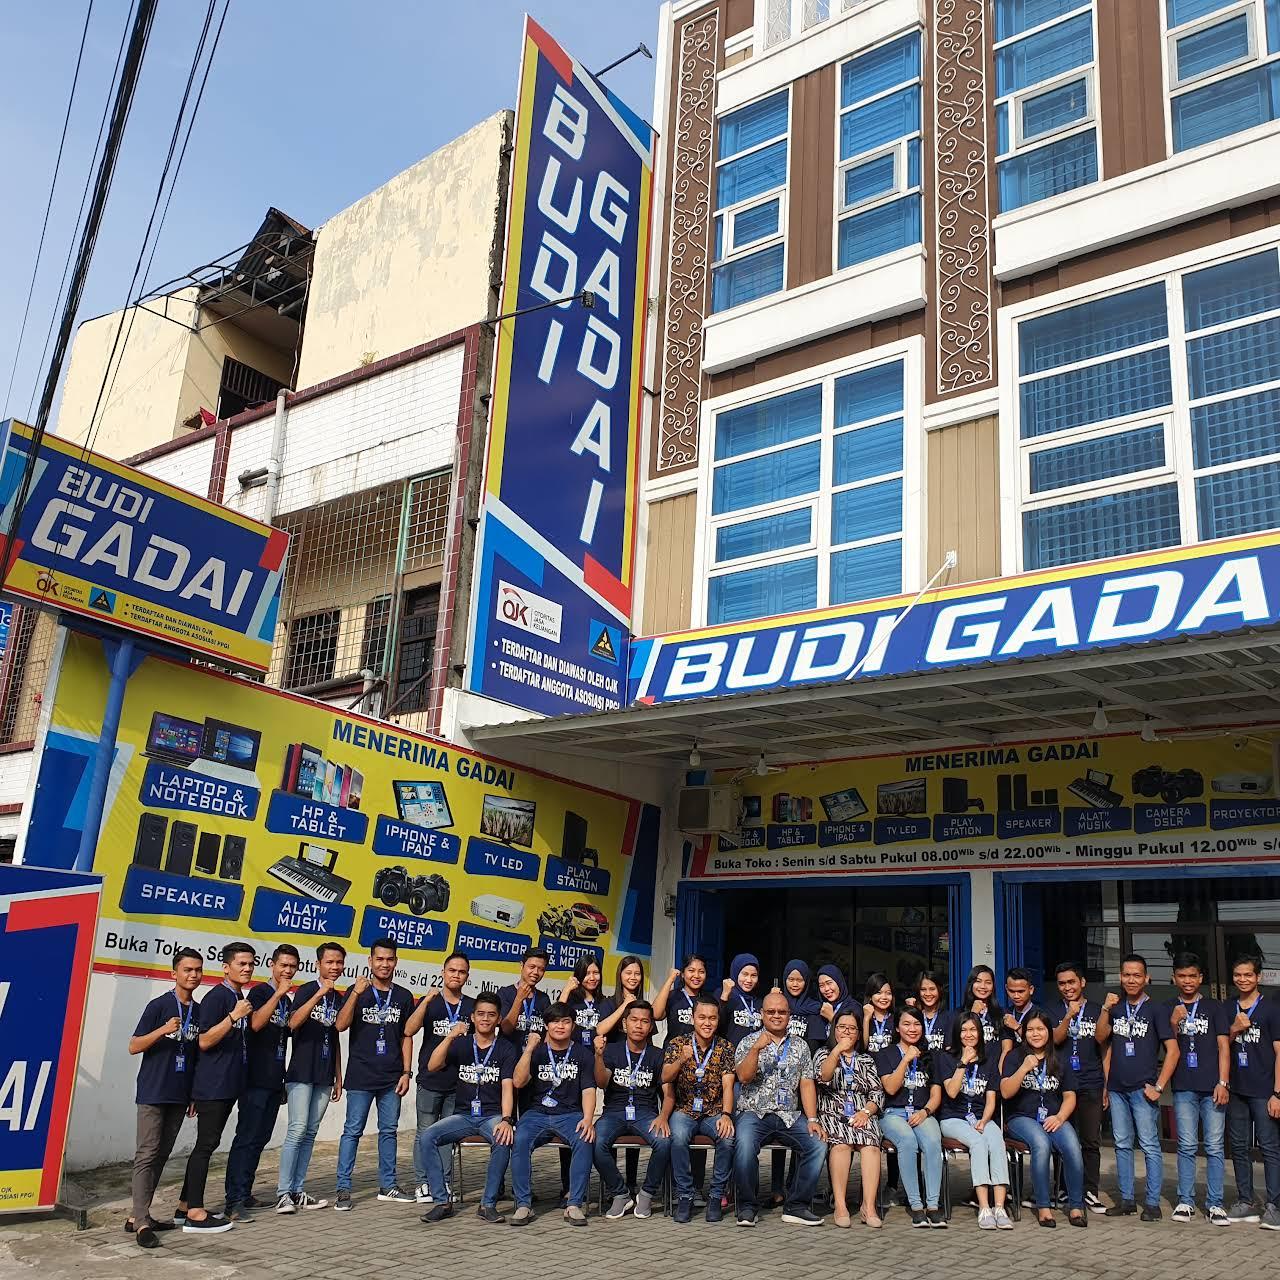 Budi Gadai Pawn Shop